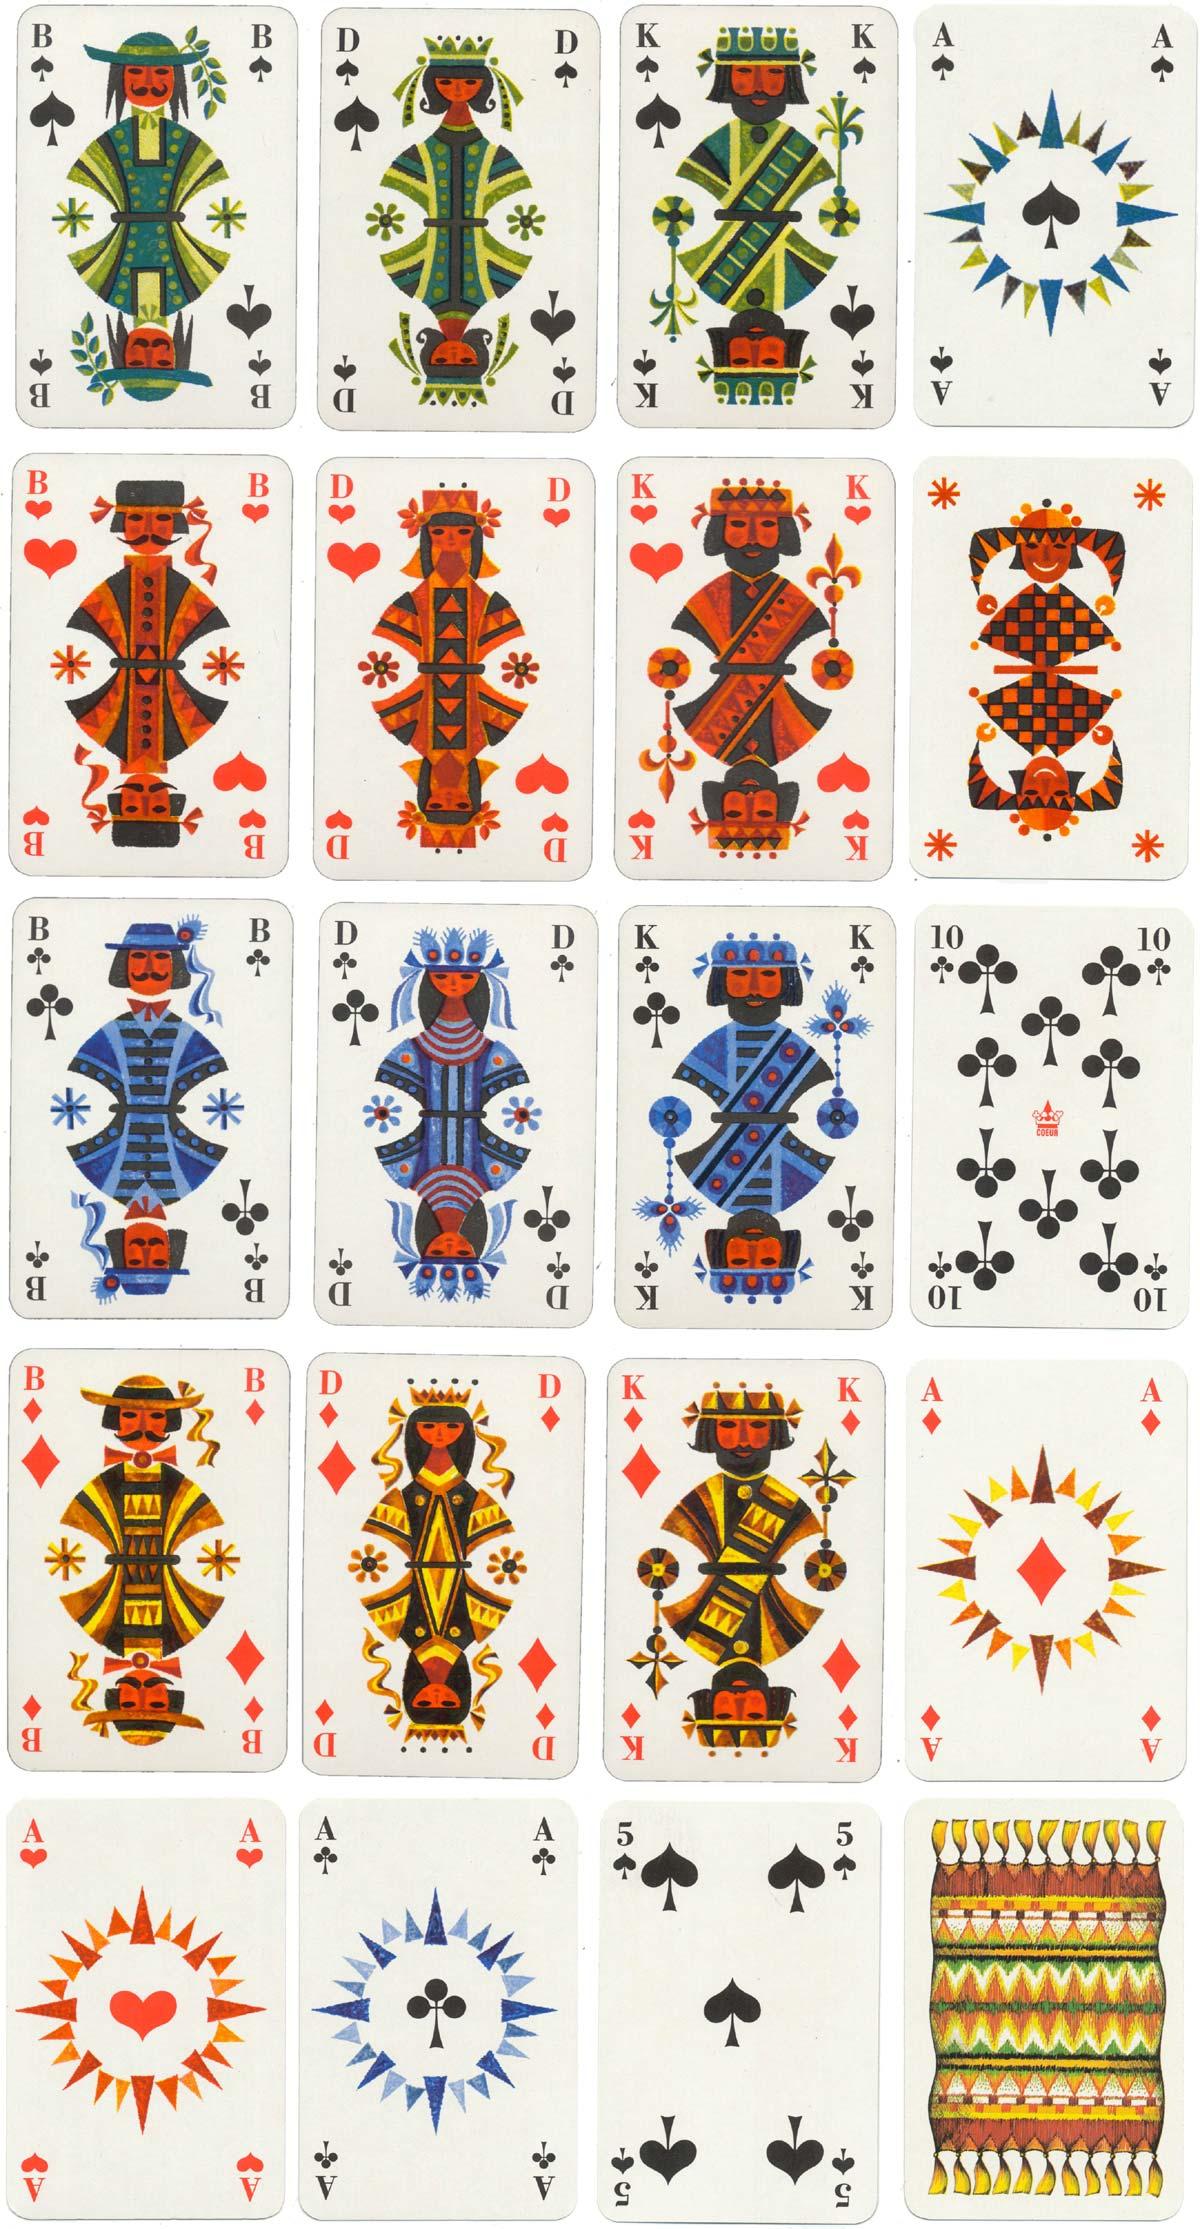 """Folklore"" deck designed by Eva & Gottfried Bormann manufactured by Altenburger Spielkarten Fabrik (Germany) first published in 1968"